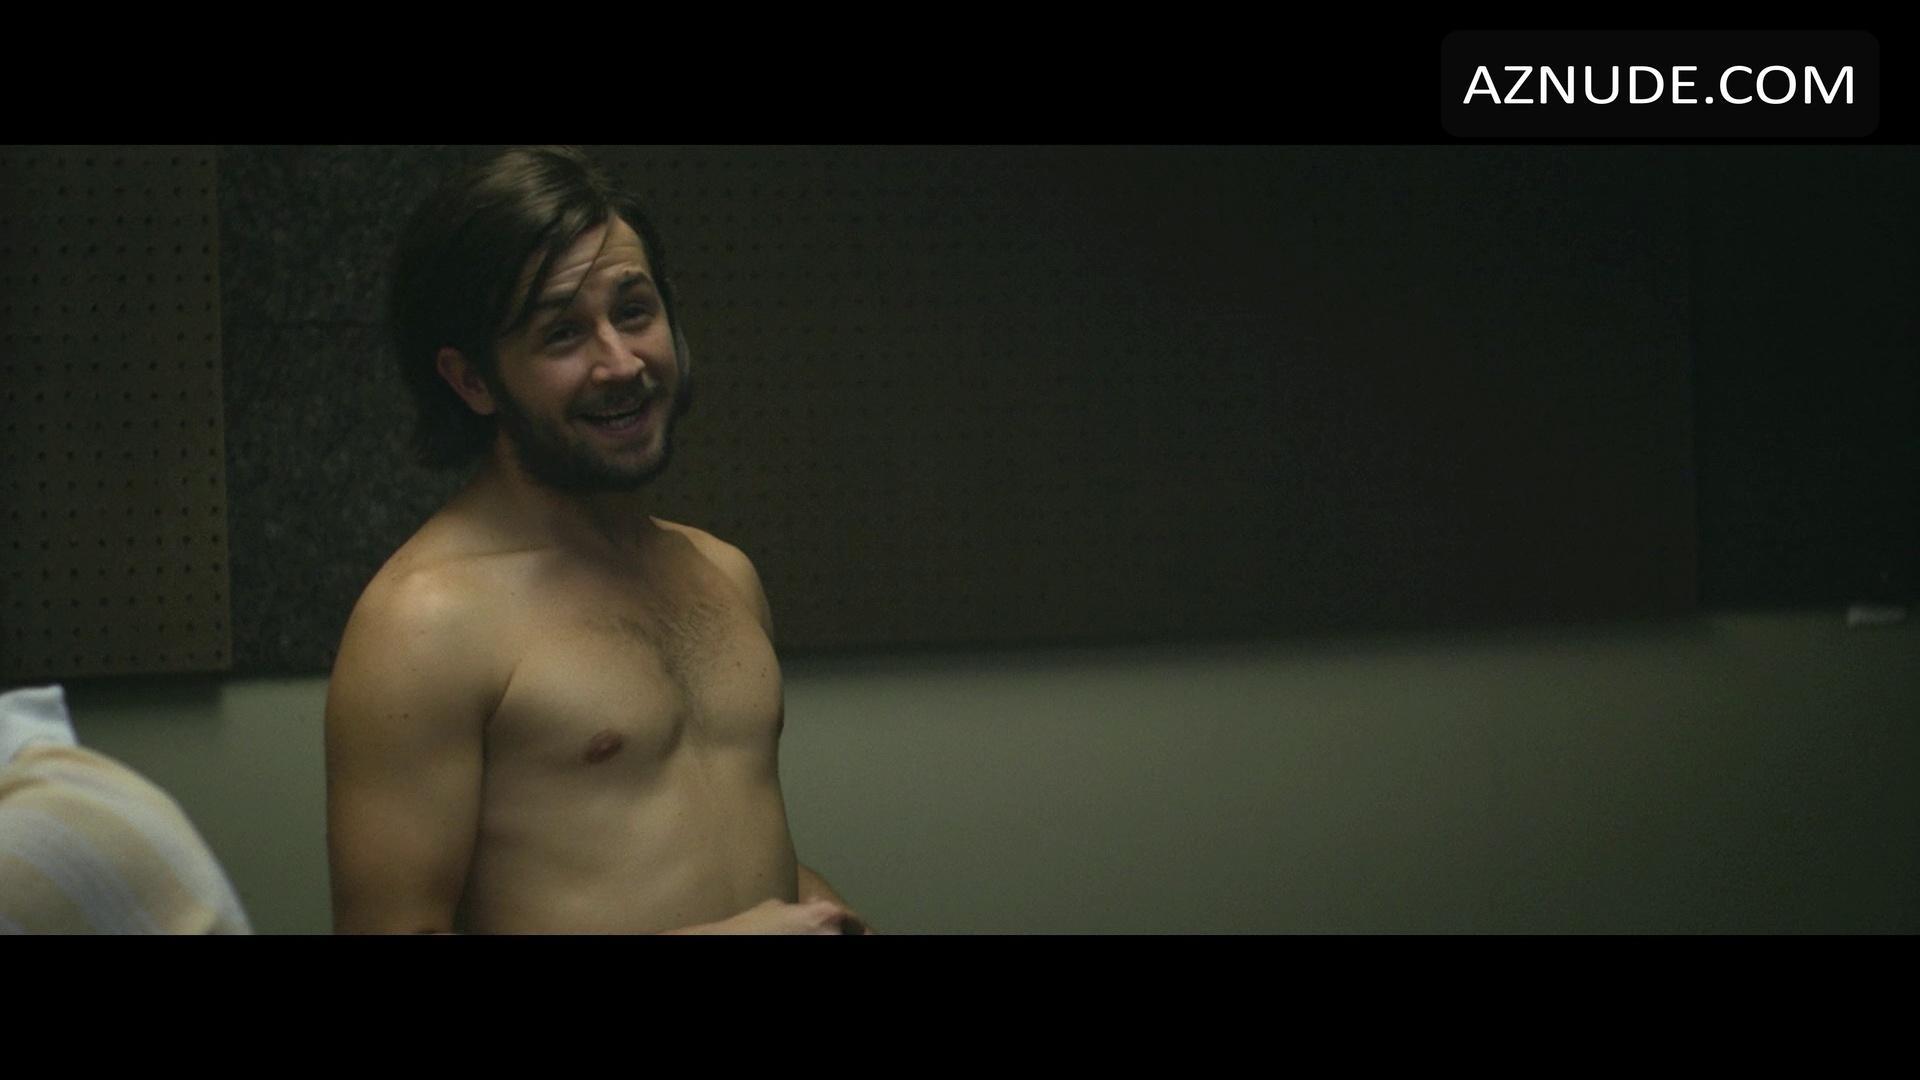 boy gay nude mp4